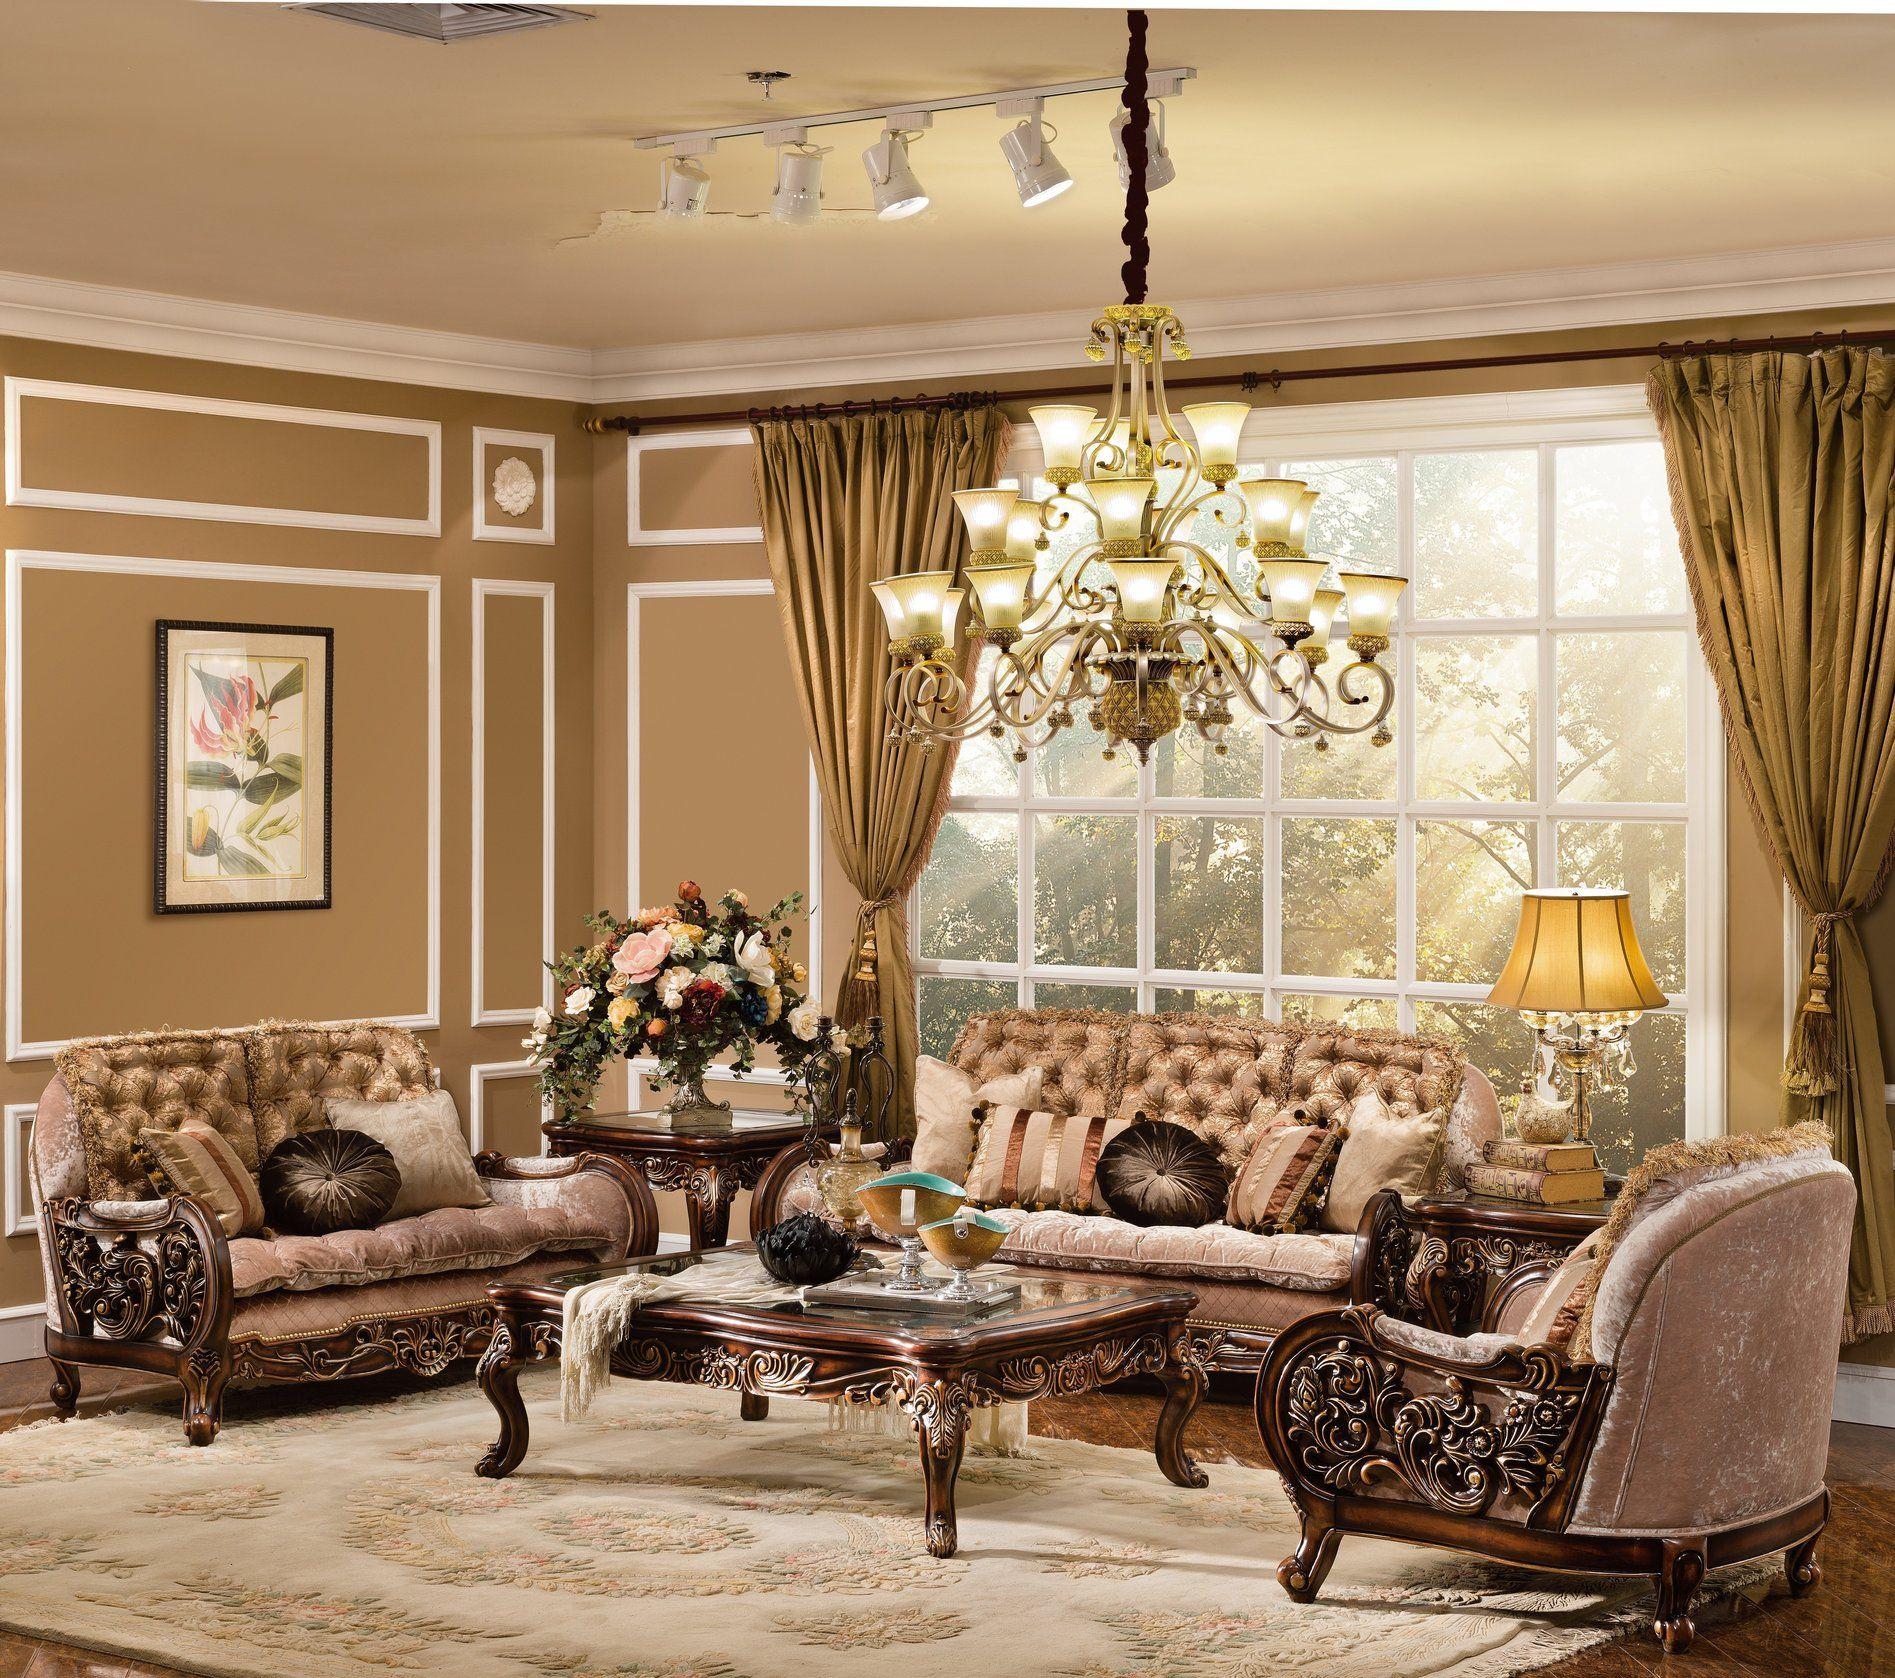 11 Smart Designs Of How To Make 3 Piece Living Room Set Cheap Living Room Sets Formal Living Room Sets Formal Living Room Furniture Living room piece sets